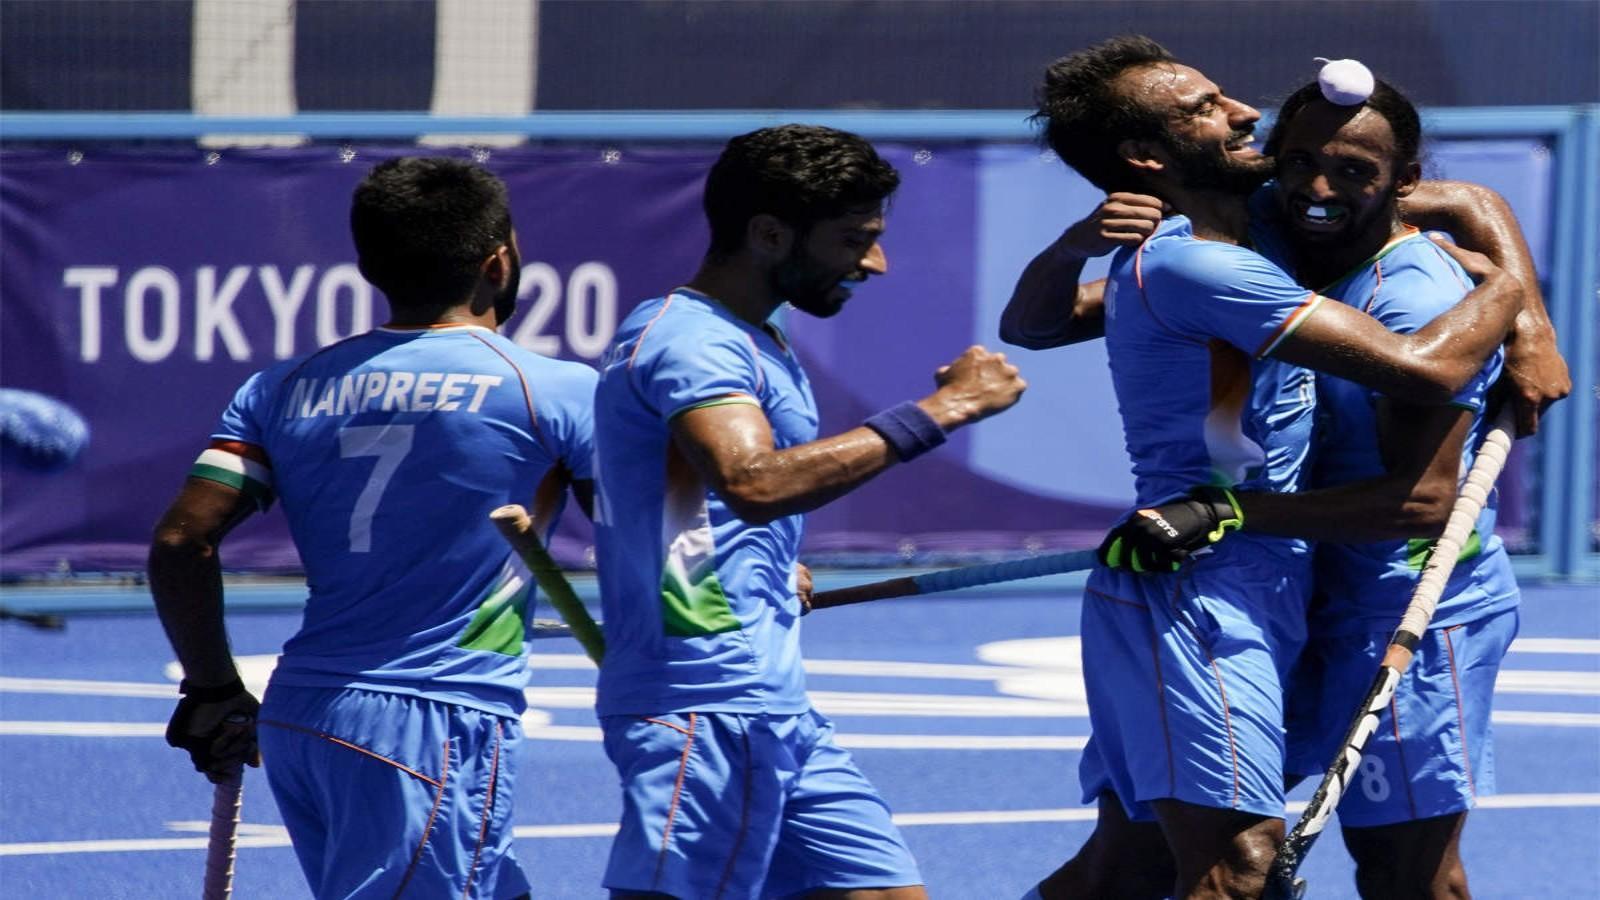 tokyo-olympics-2021-india-beat-germany-5-4-to-win-historic-bronze-medal-in-mens-hockey